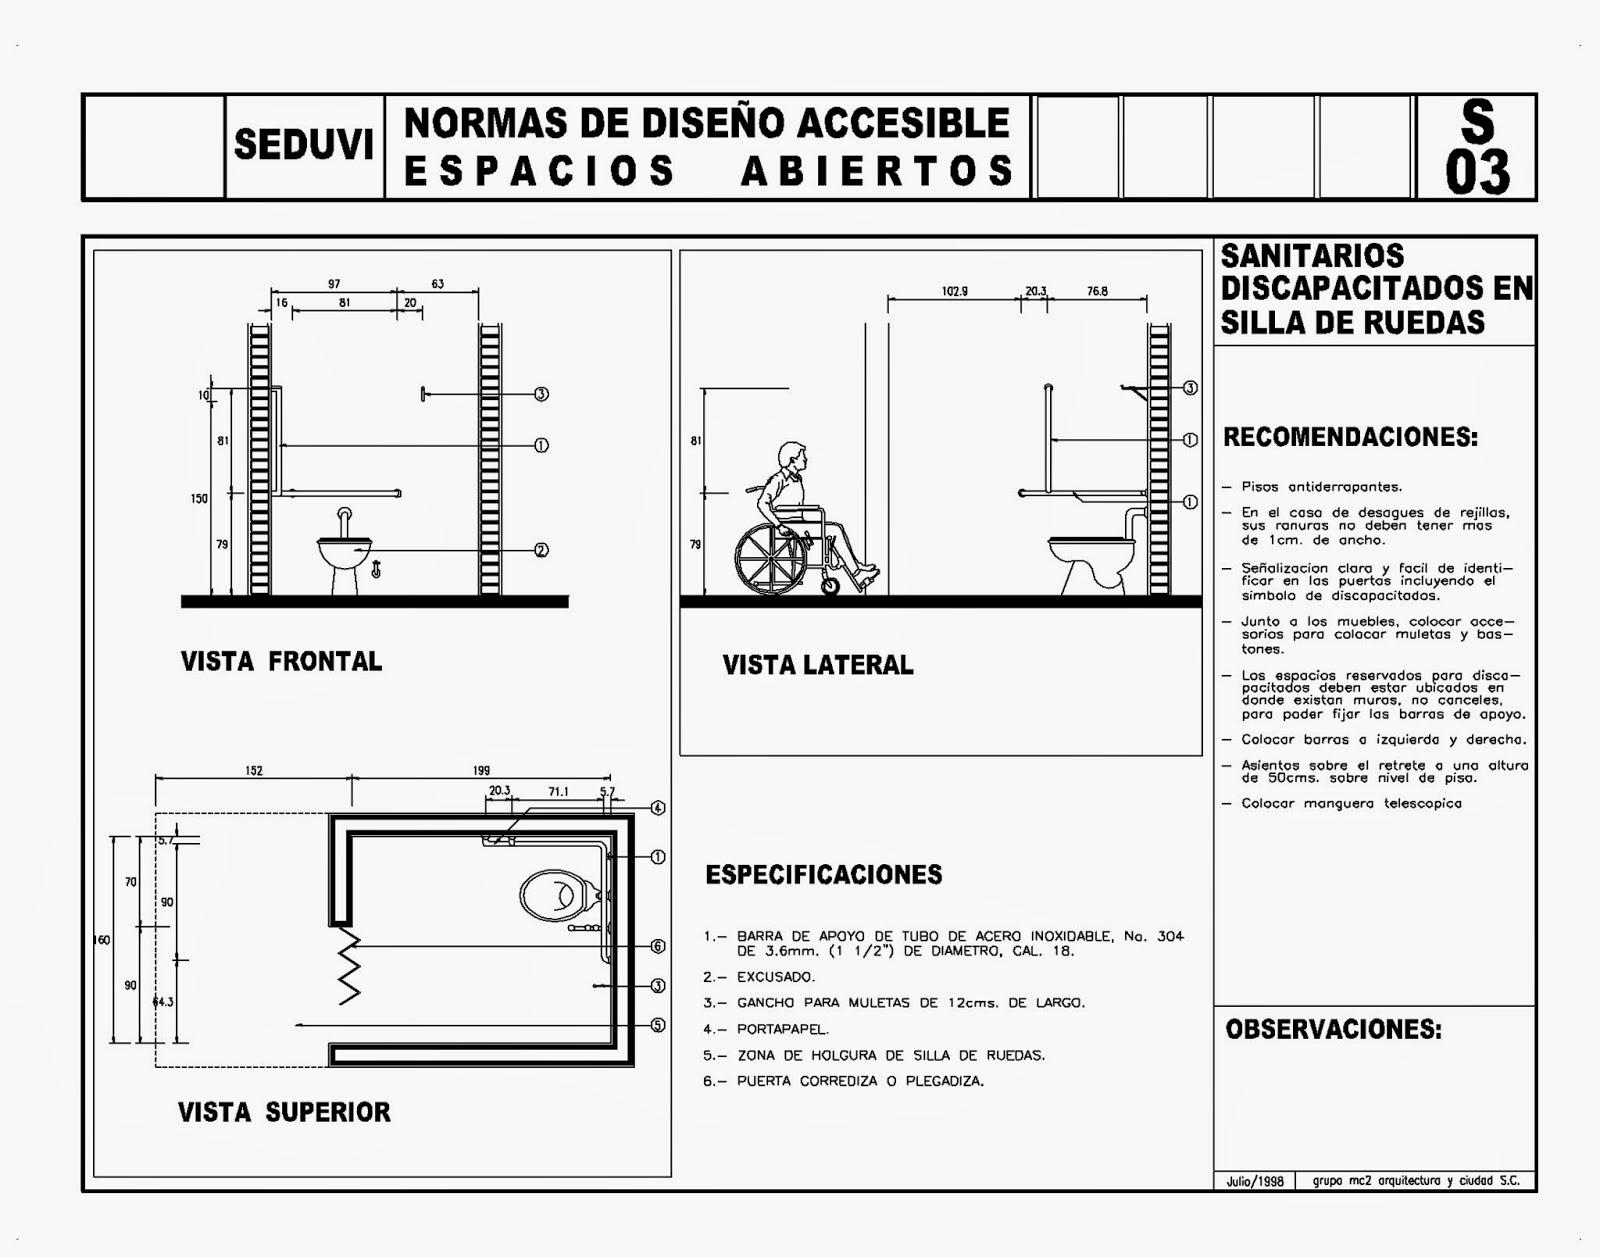 baño discapacitados bloque ~ dikidu.com - Puertas De Bano Para Discapacitados